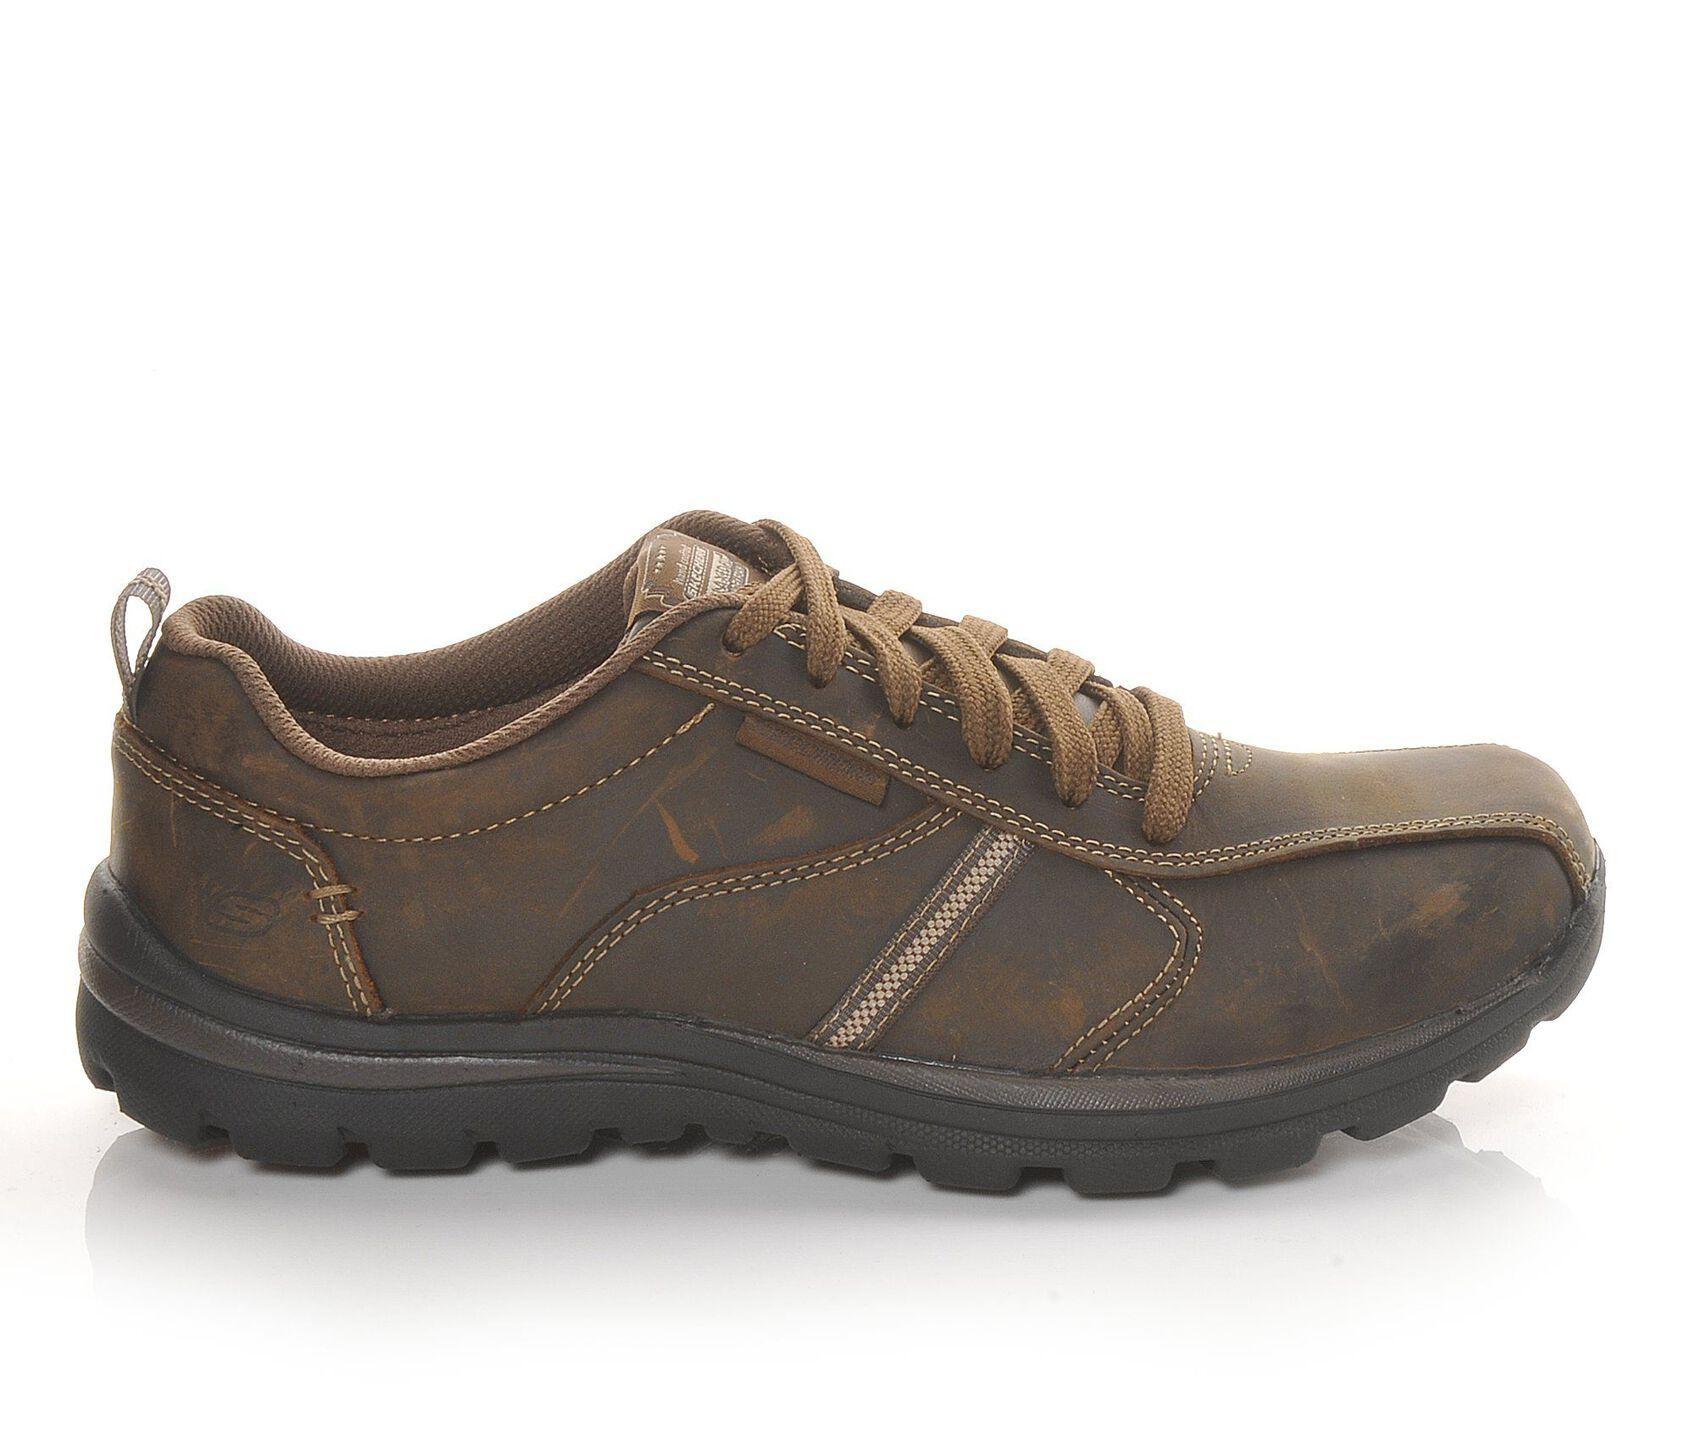 skechers relaxed fit levoy men's shoes black